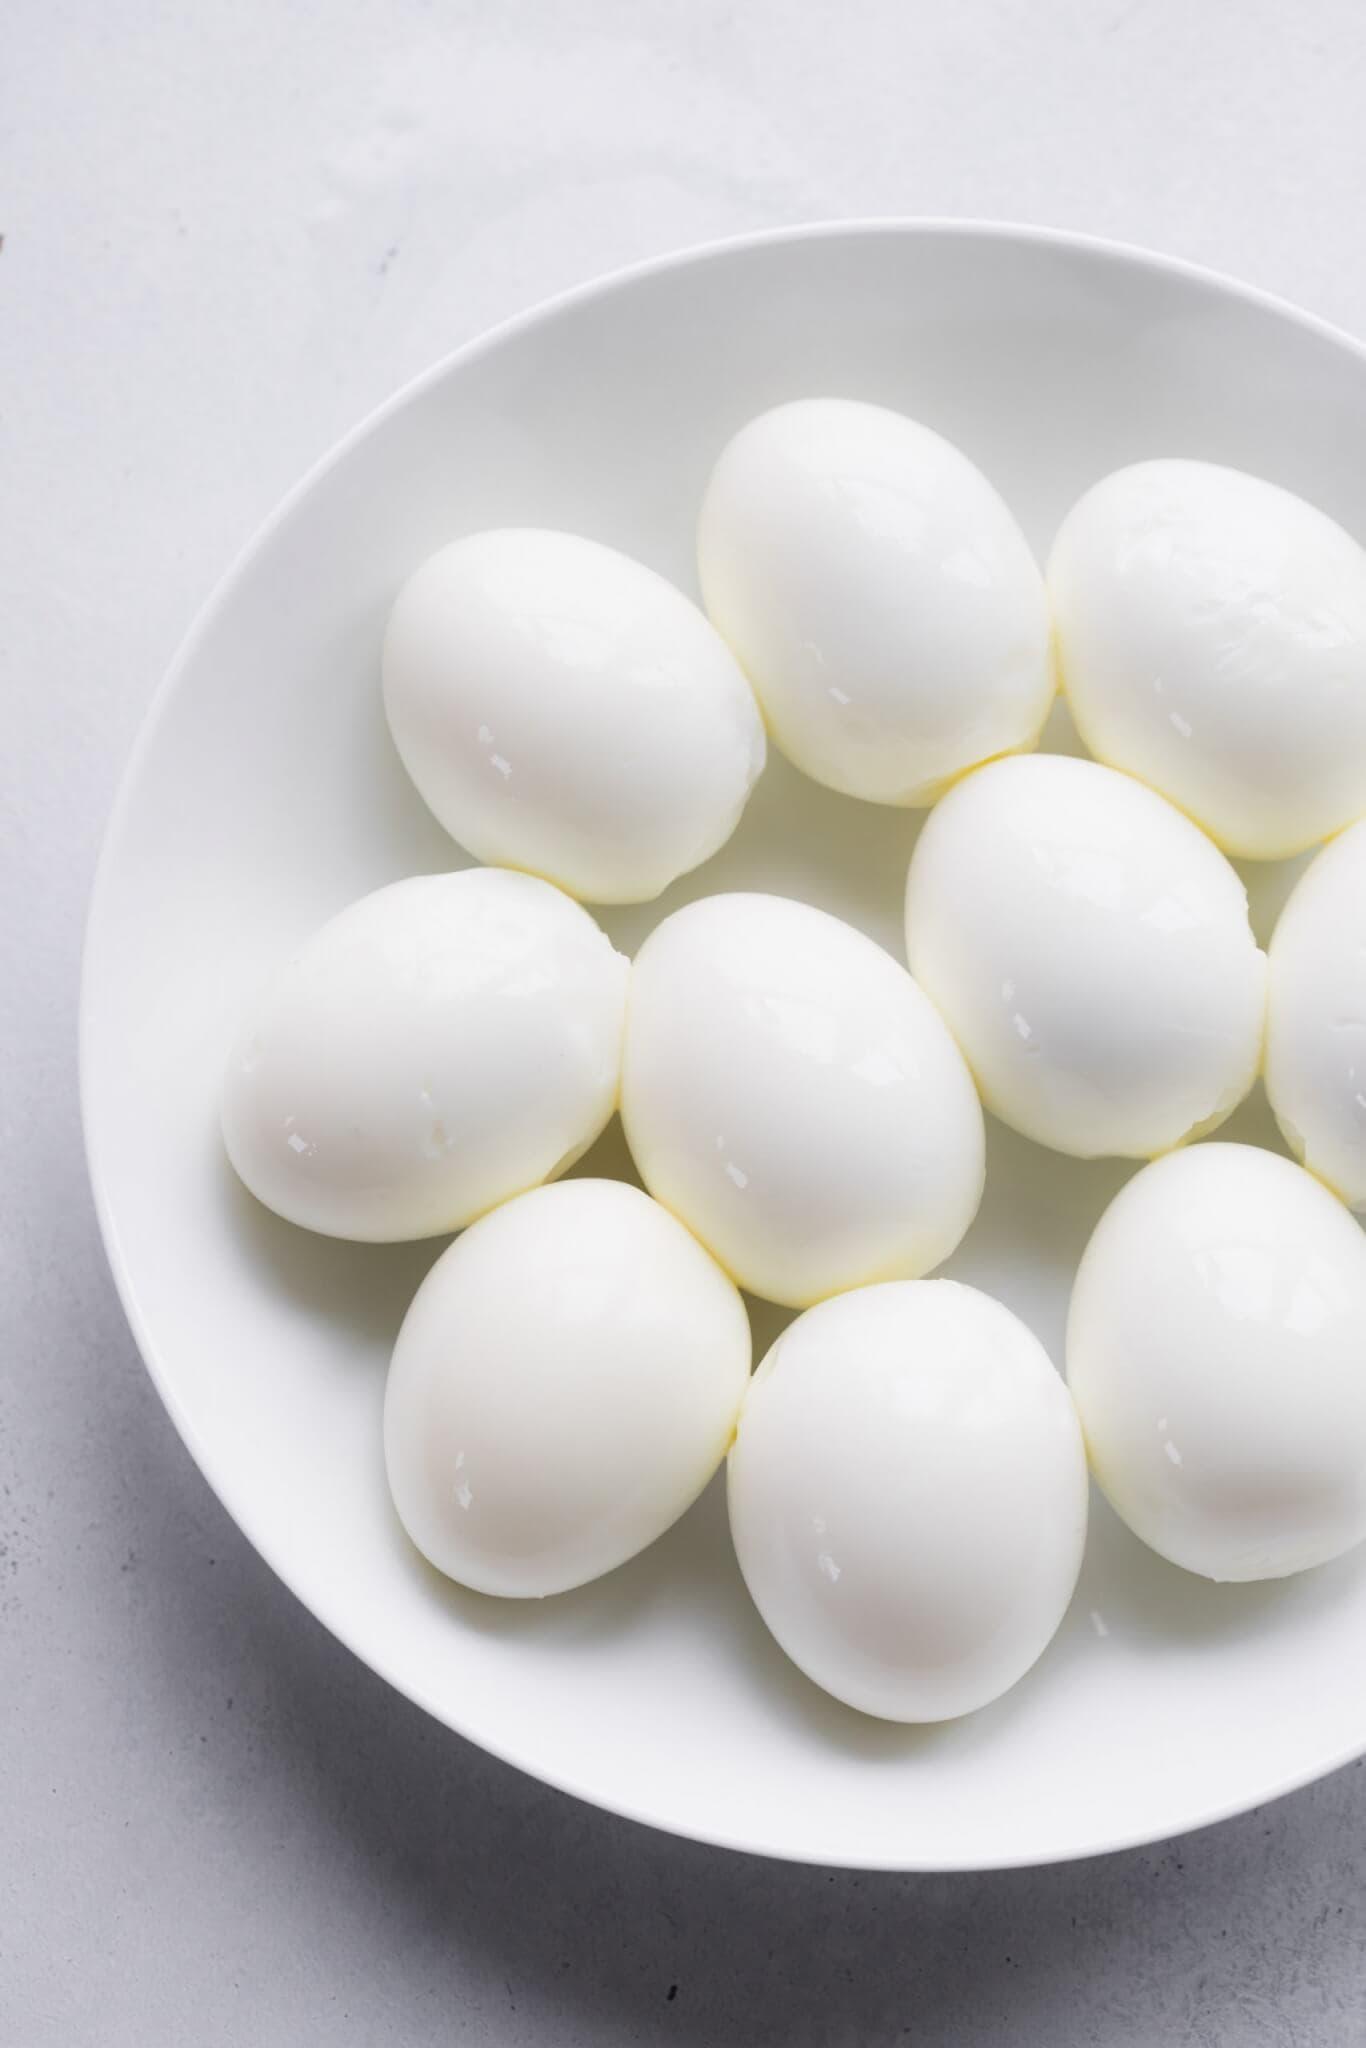 Bowl of peeled hard boiled eggs